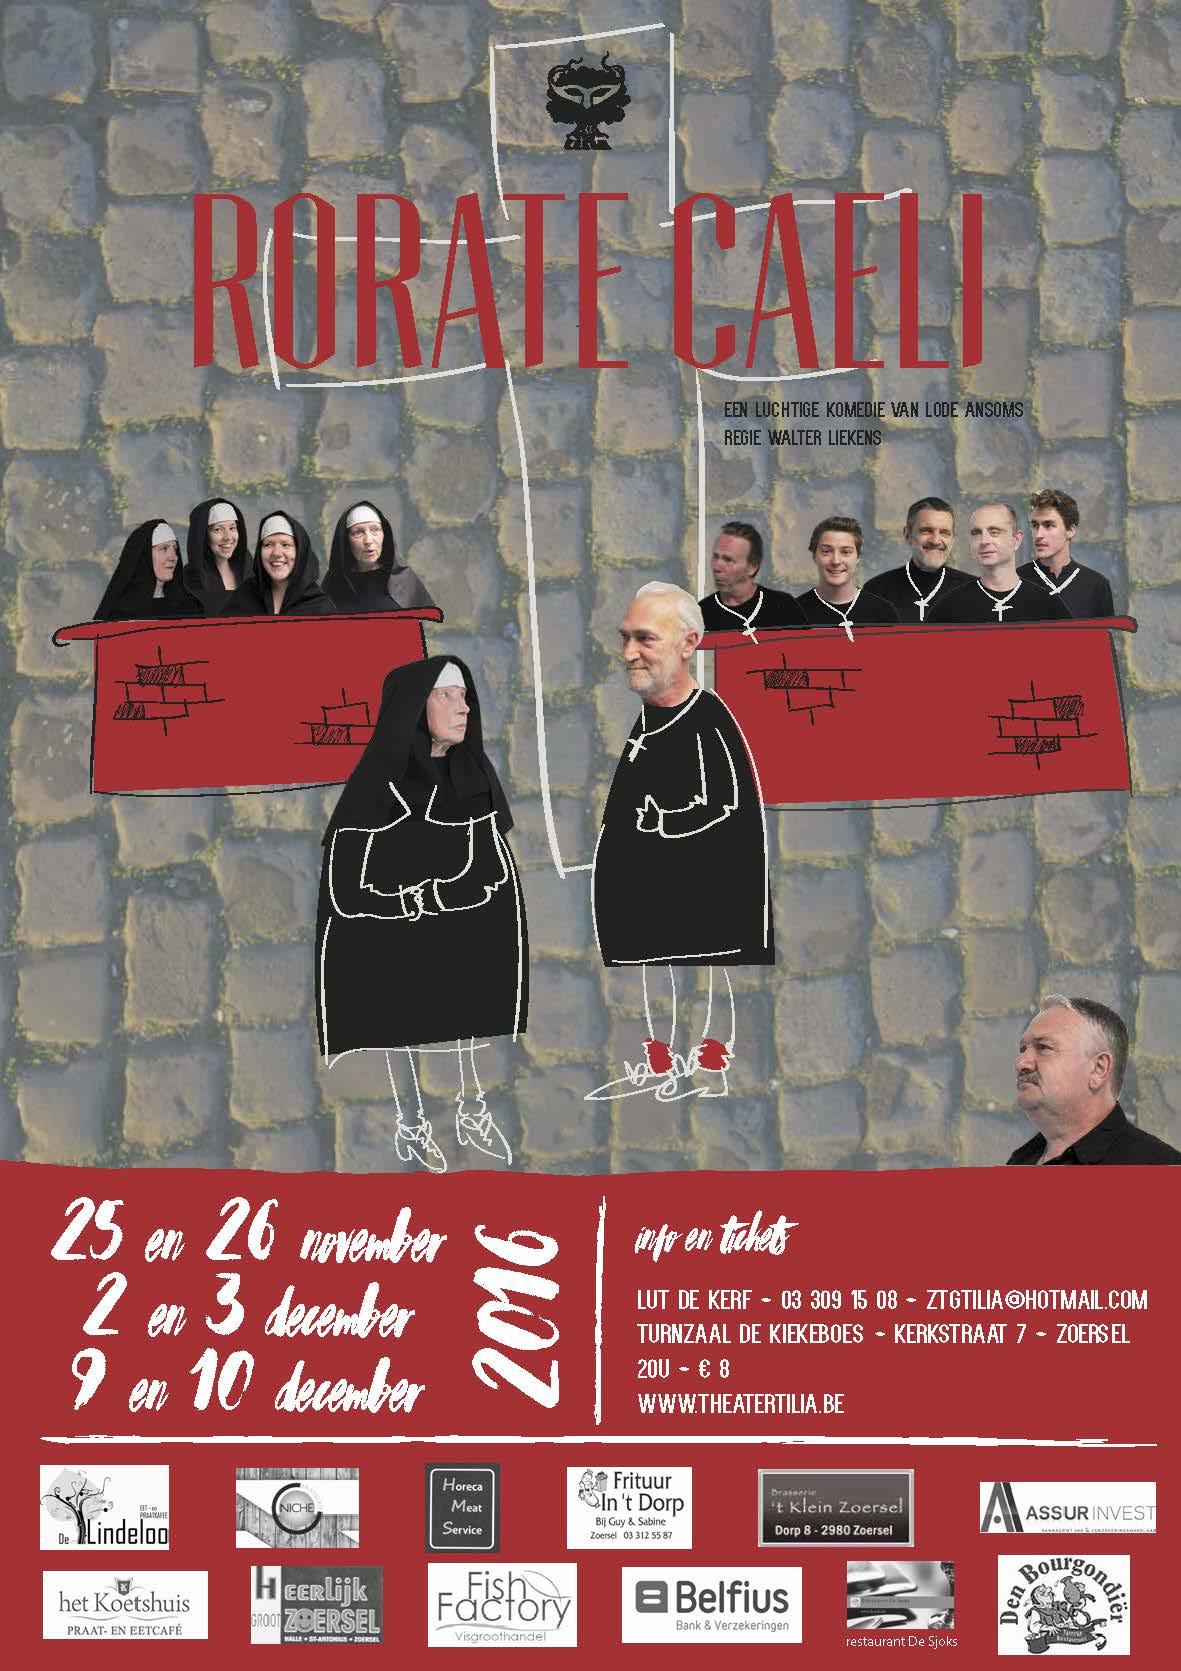 poster_roratecaeli